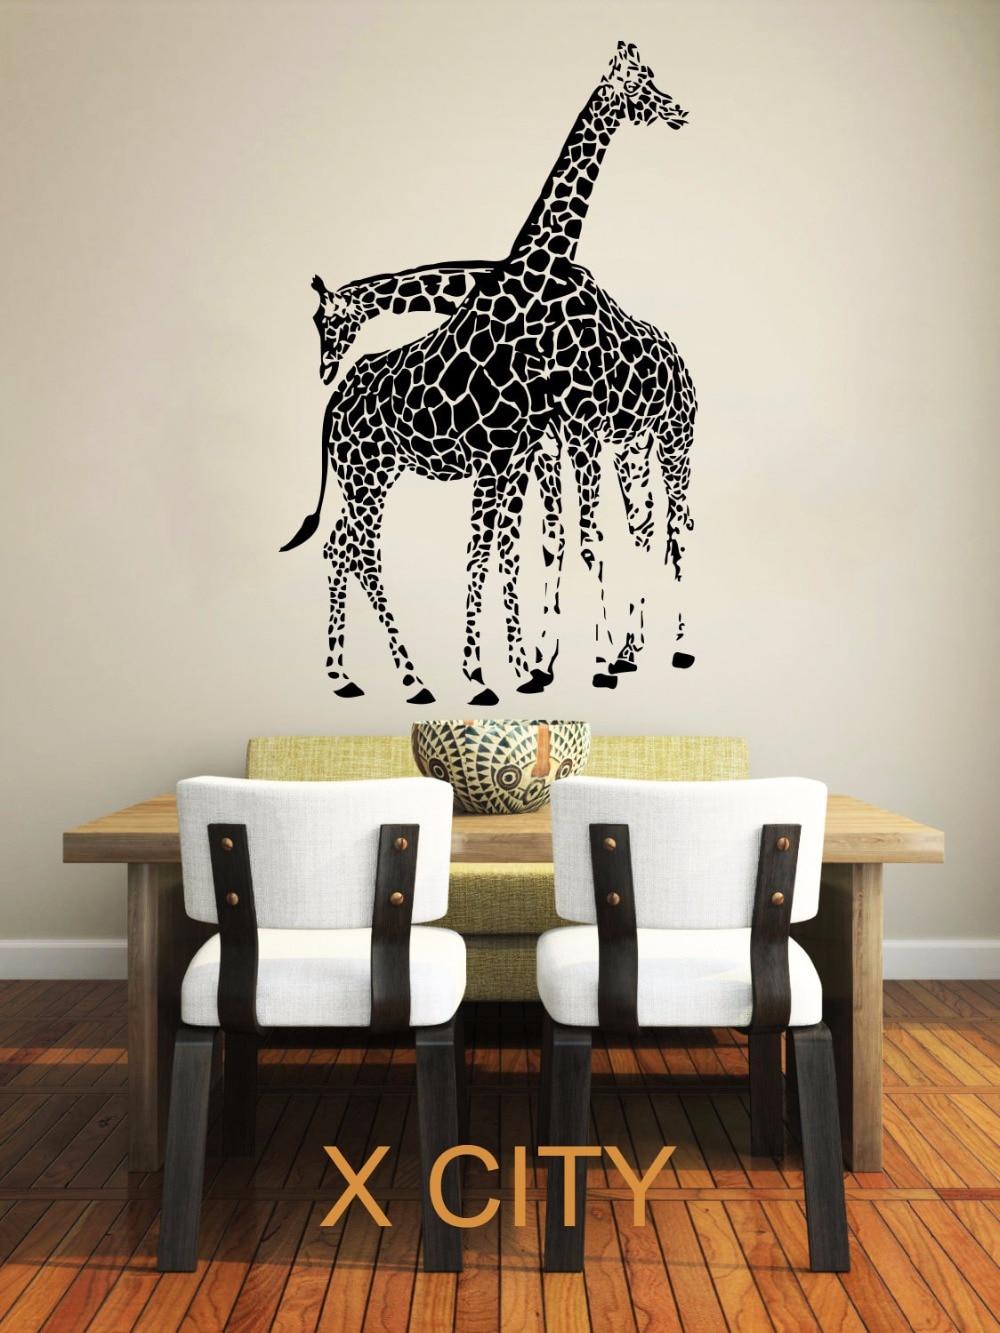 Giraffe Animals Jungle Safari African Childrens Decor Kids Vinyl Sticker Wall Decal Nursery Bedroom Murals Playroom